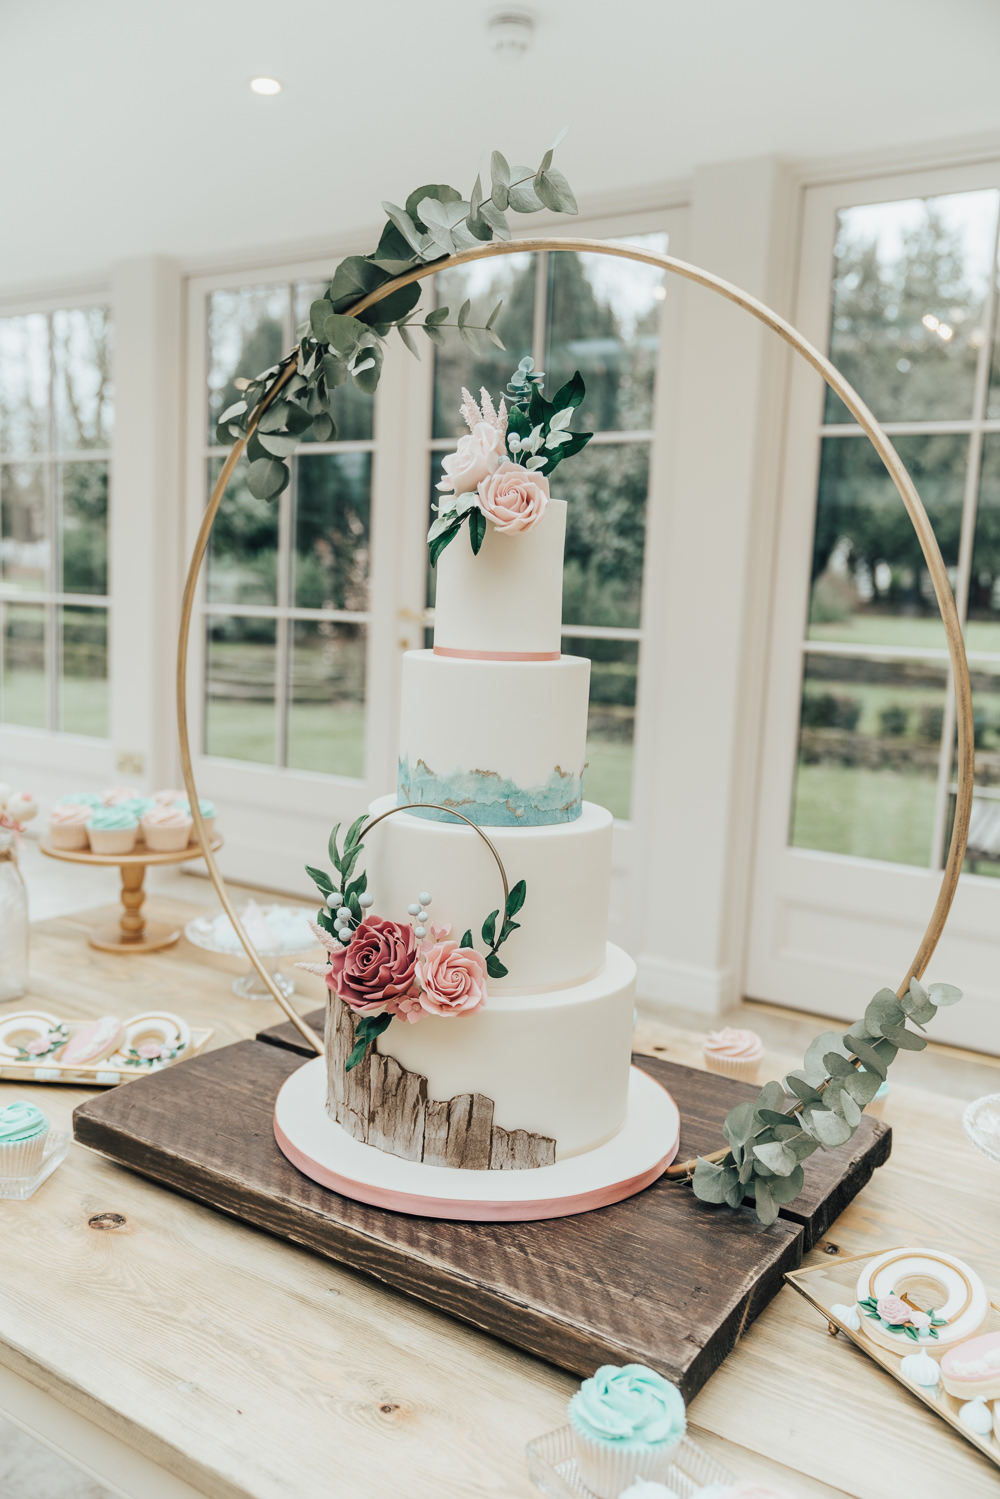 Cake Wreath Floral Flowers Wood Brush Stokes Backdrop Table Hoop Wedding Ideas Rebecca Carpenter Photograph